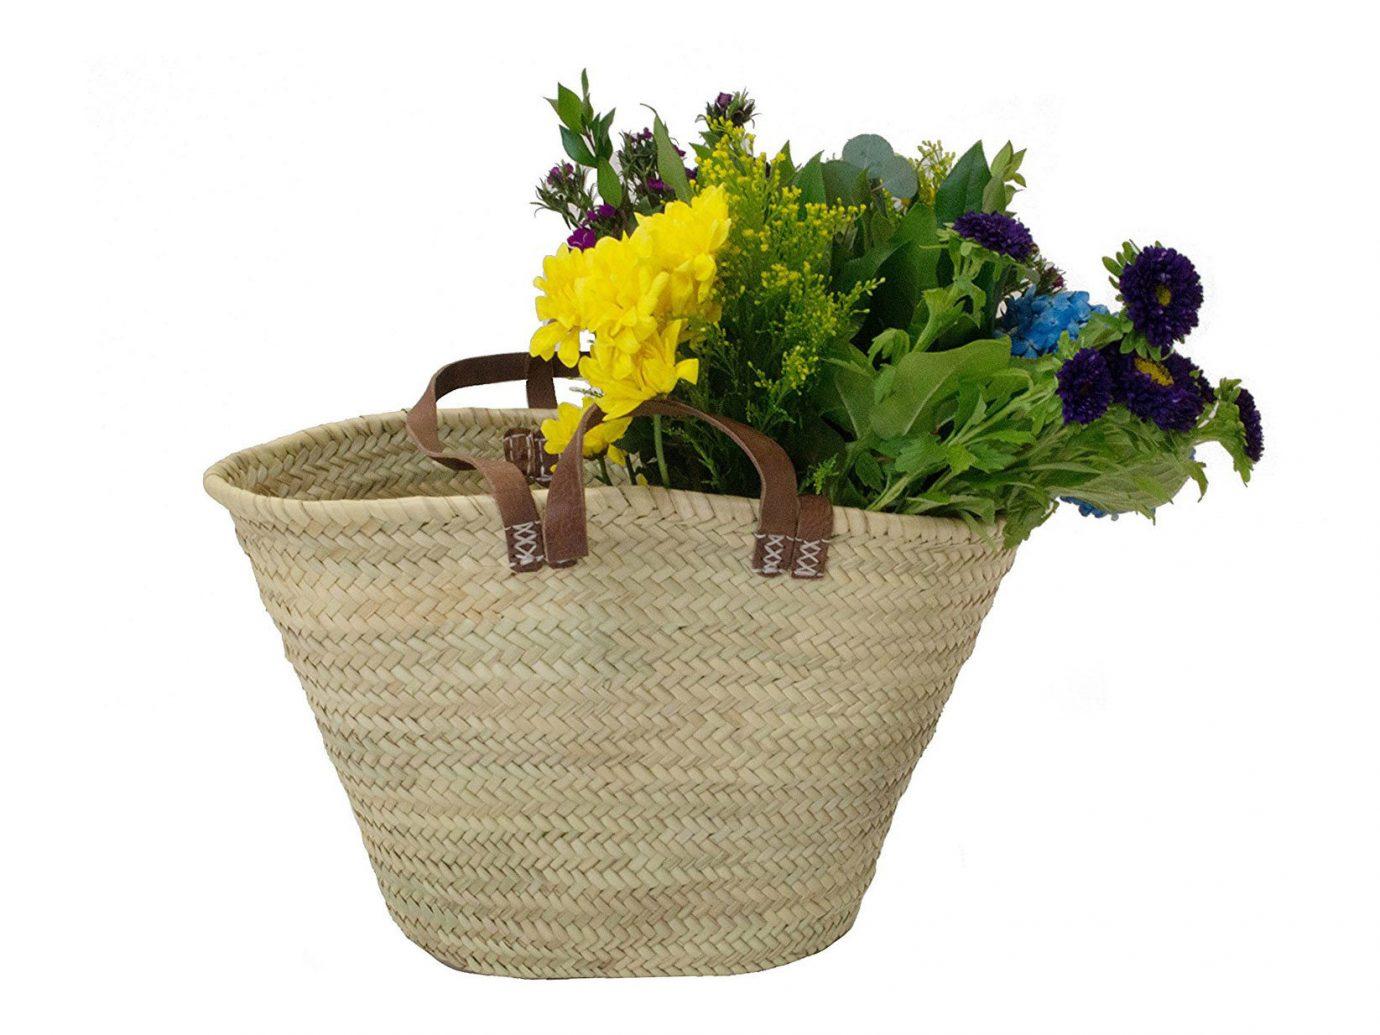 Style + Design flower indoor basket plant container floristry flowerpot flowering plant